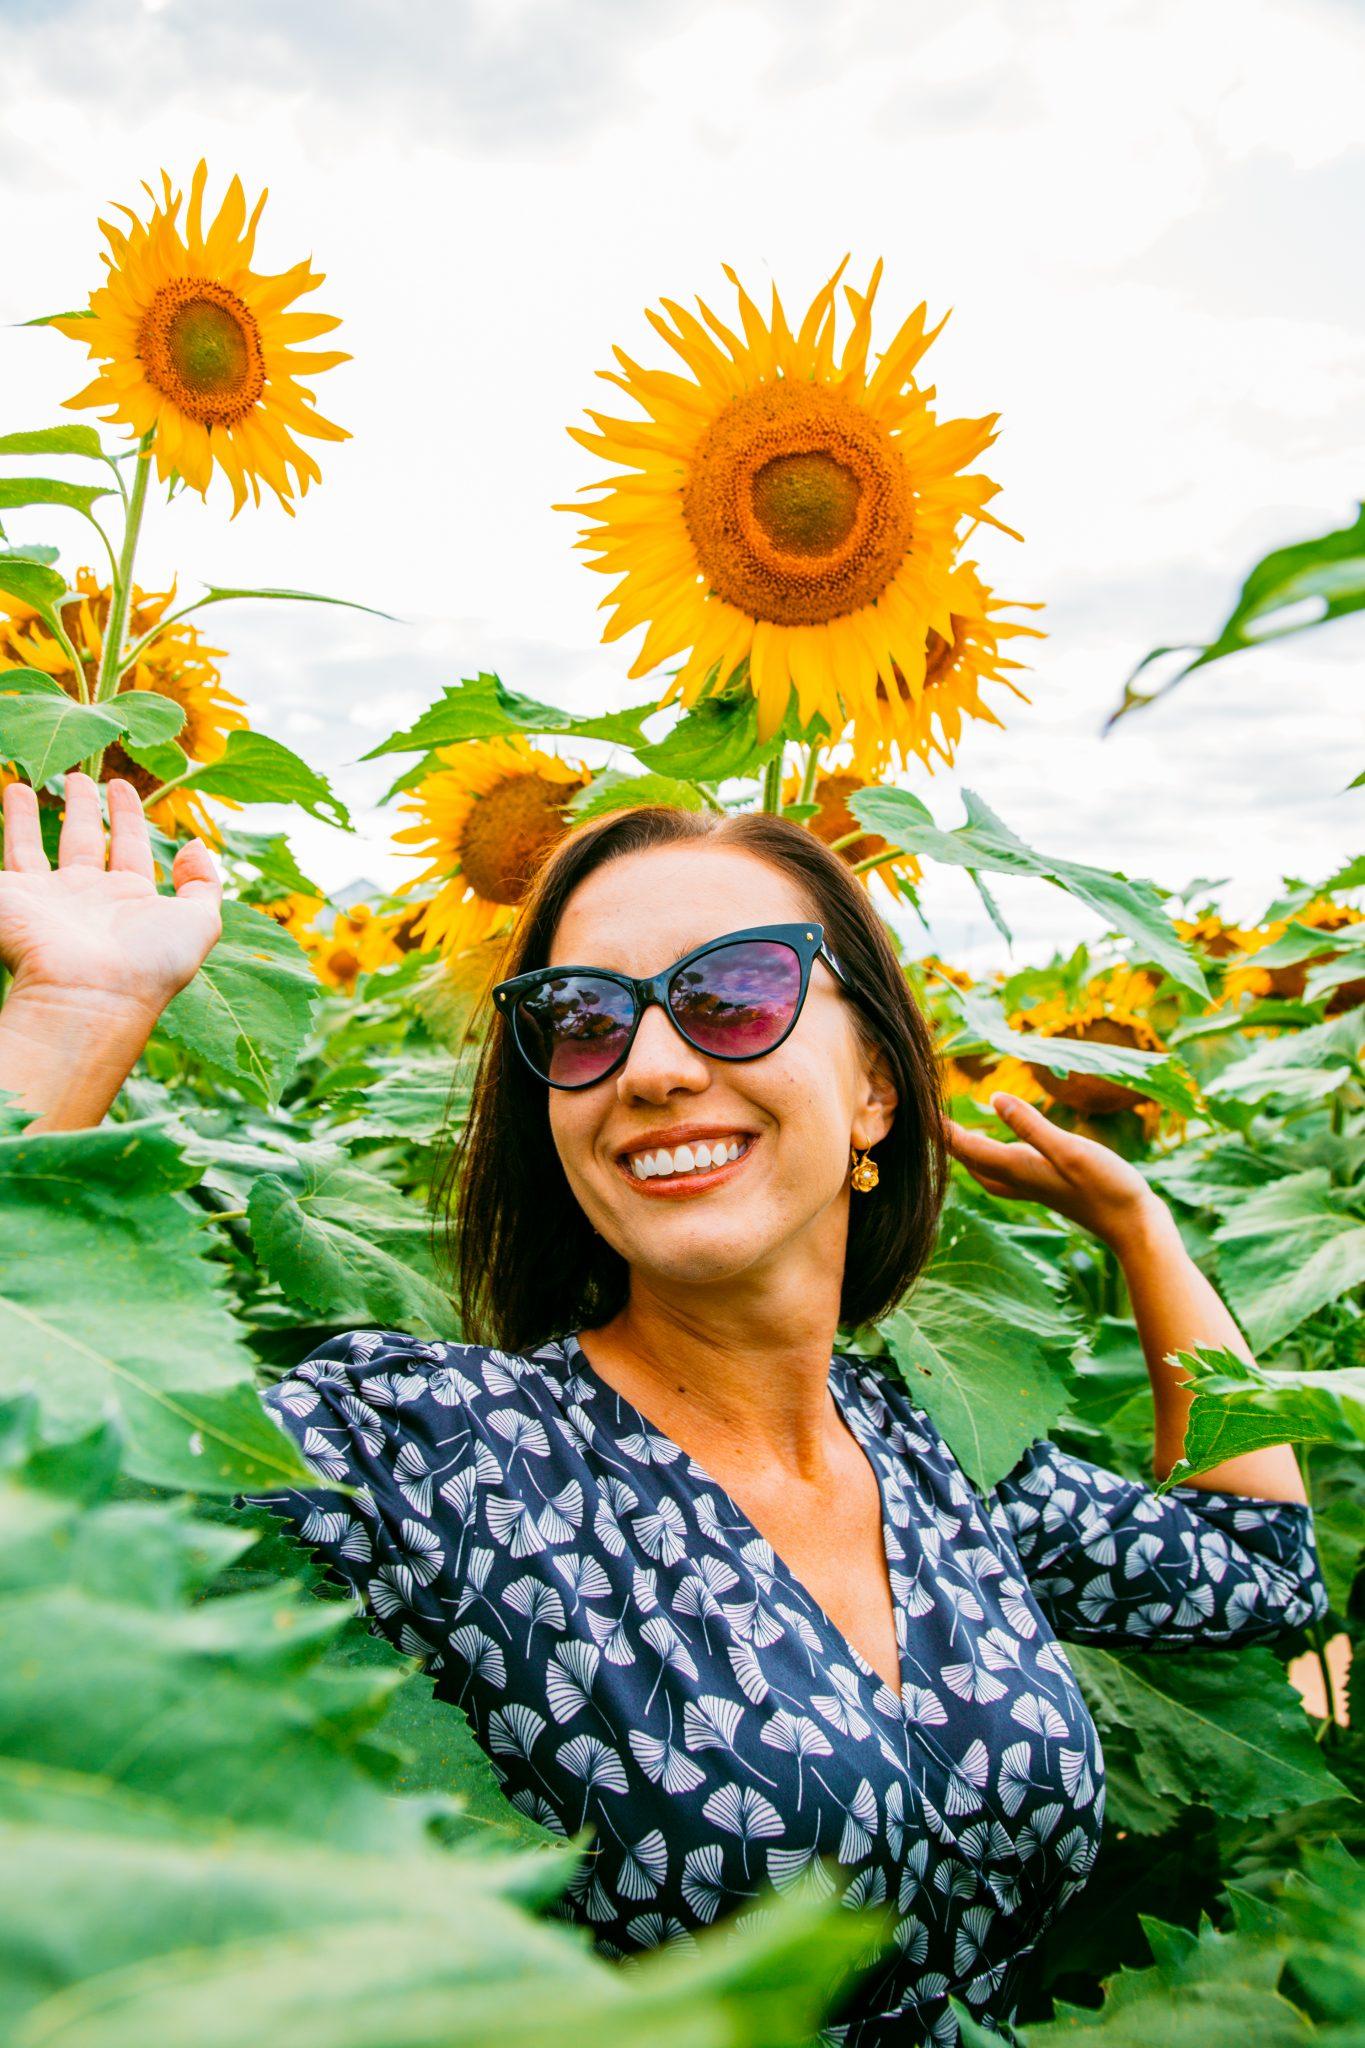 Karina Megan Dress Review – Worn in Summer & Winter